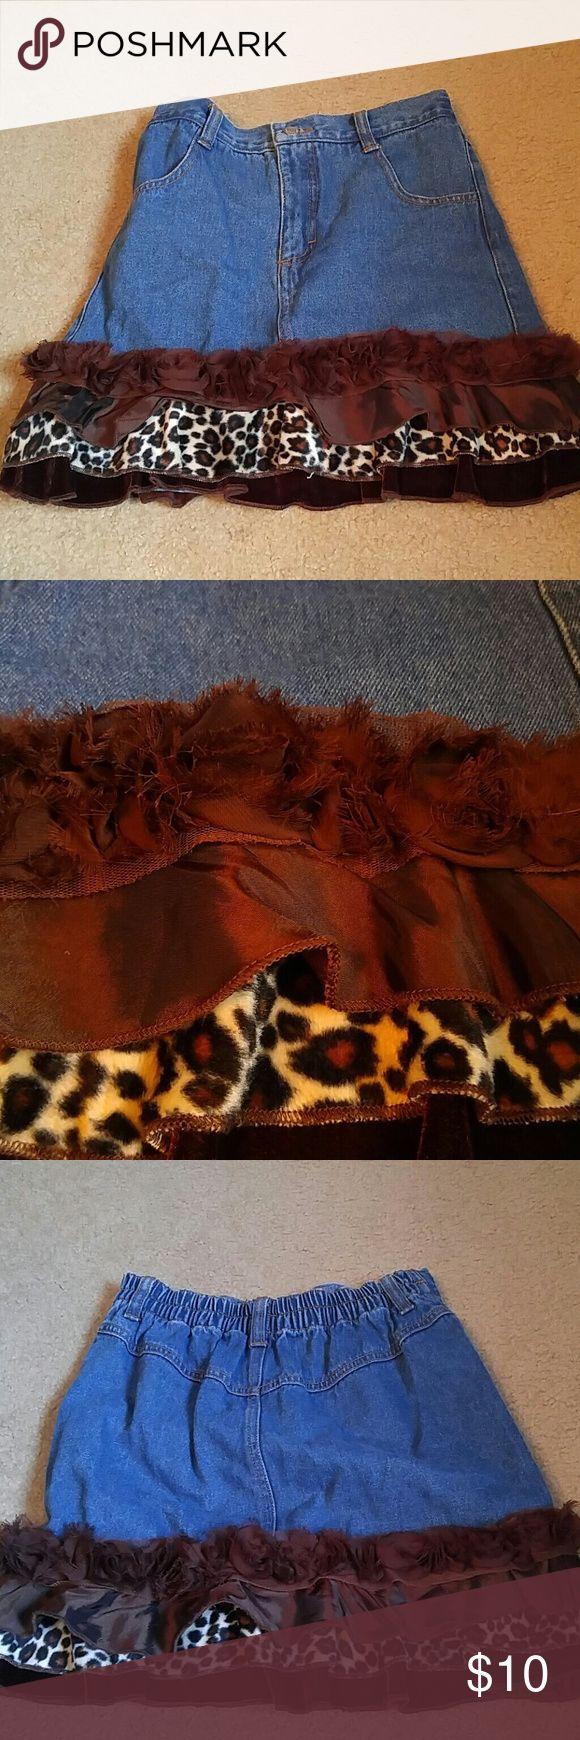 Greggy Girl Denim Skirt Brown Leopard Trim Sz 8 Greggy Girl Denim Skirt with Brown Leopard Trim. And ruffled flower trim. Sz 8. Elastic waist. EXCELLENT shape! Greggy Girl Bottoms Skirts